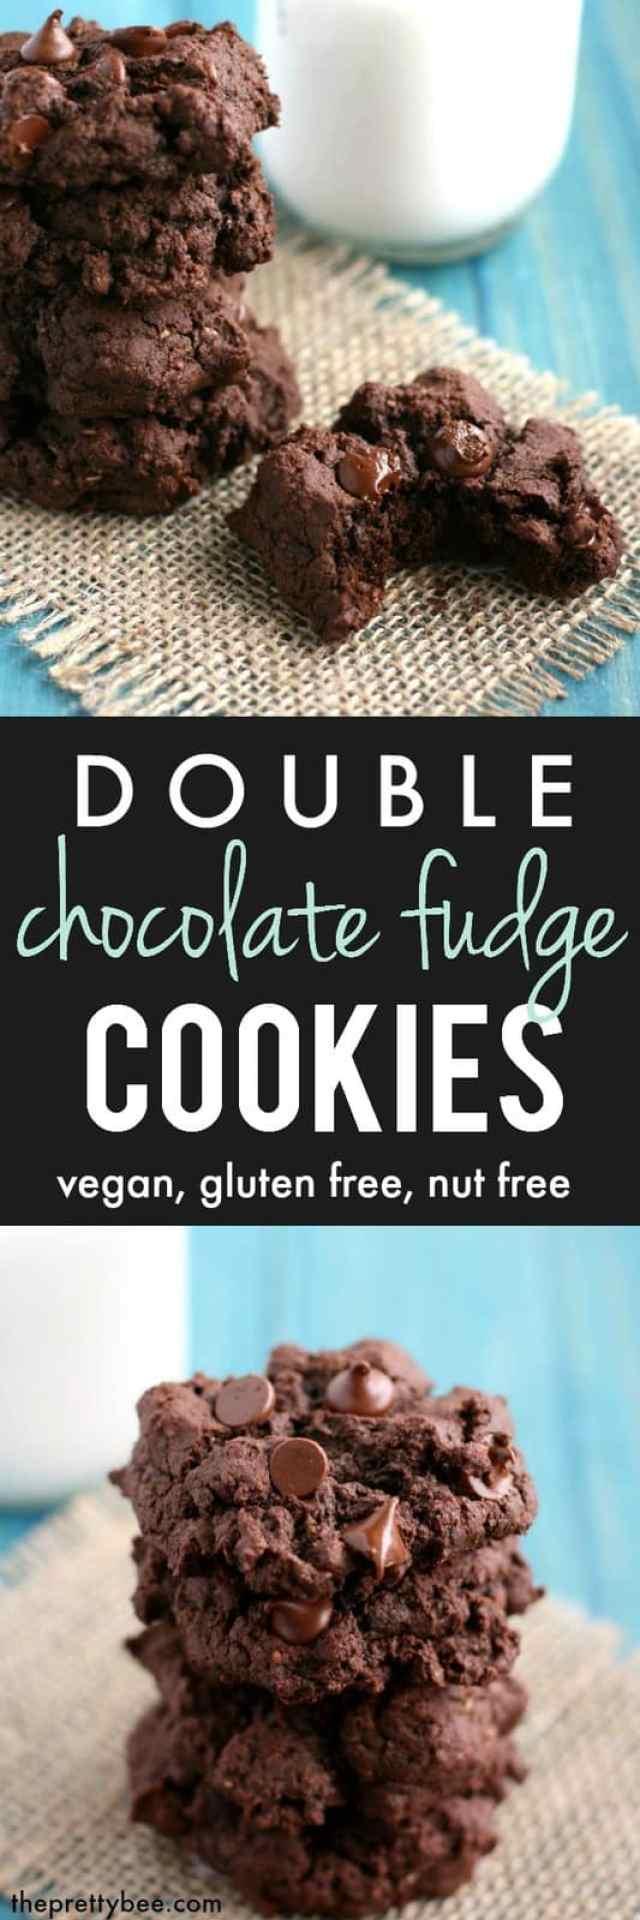 Decadent gluten free double chocolate fudge cookie recipe